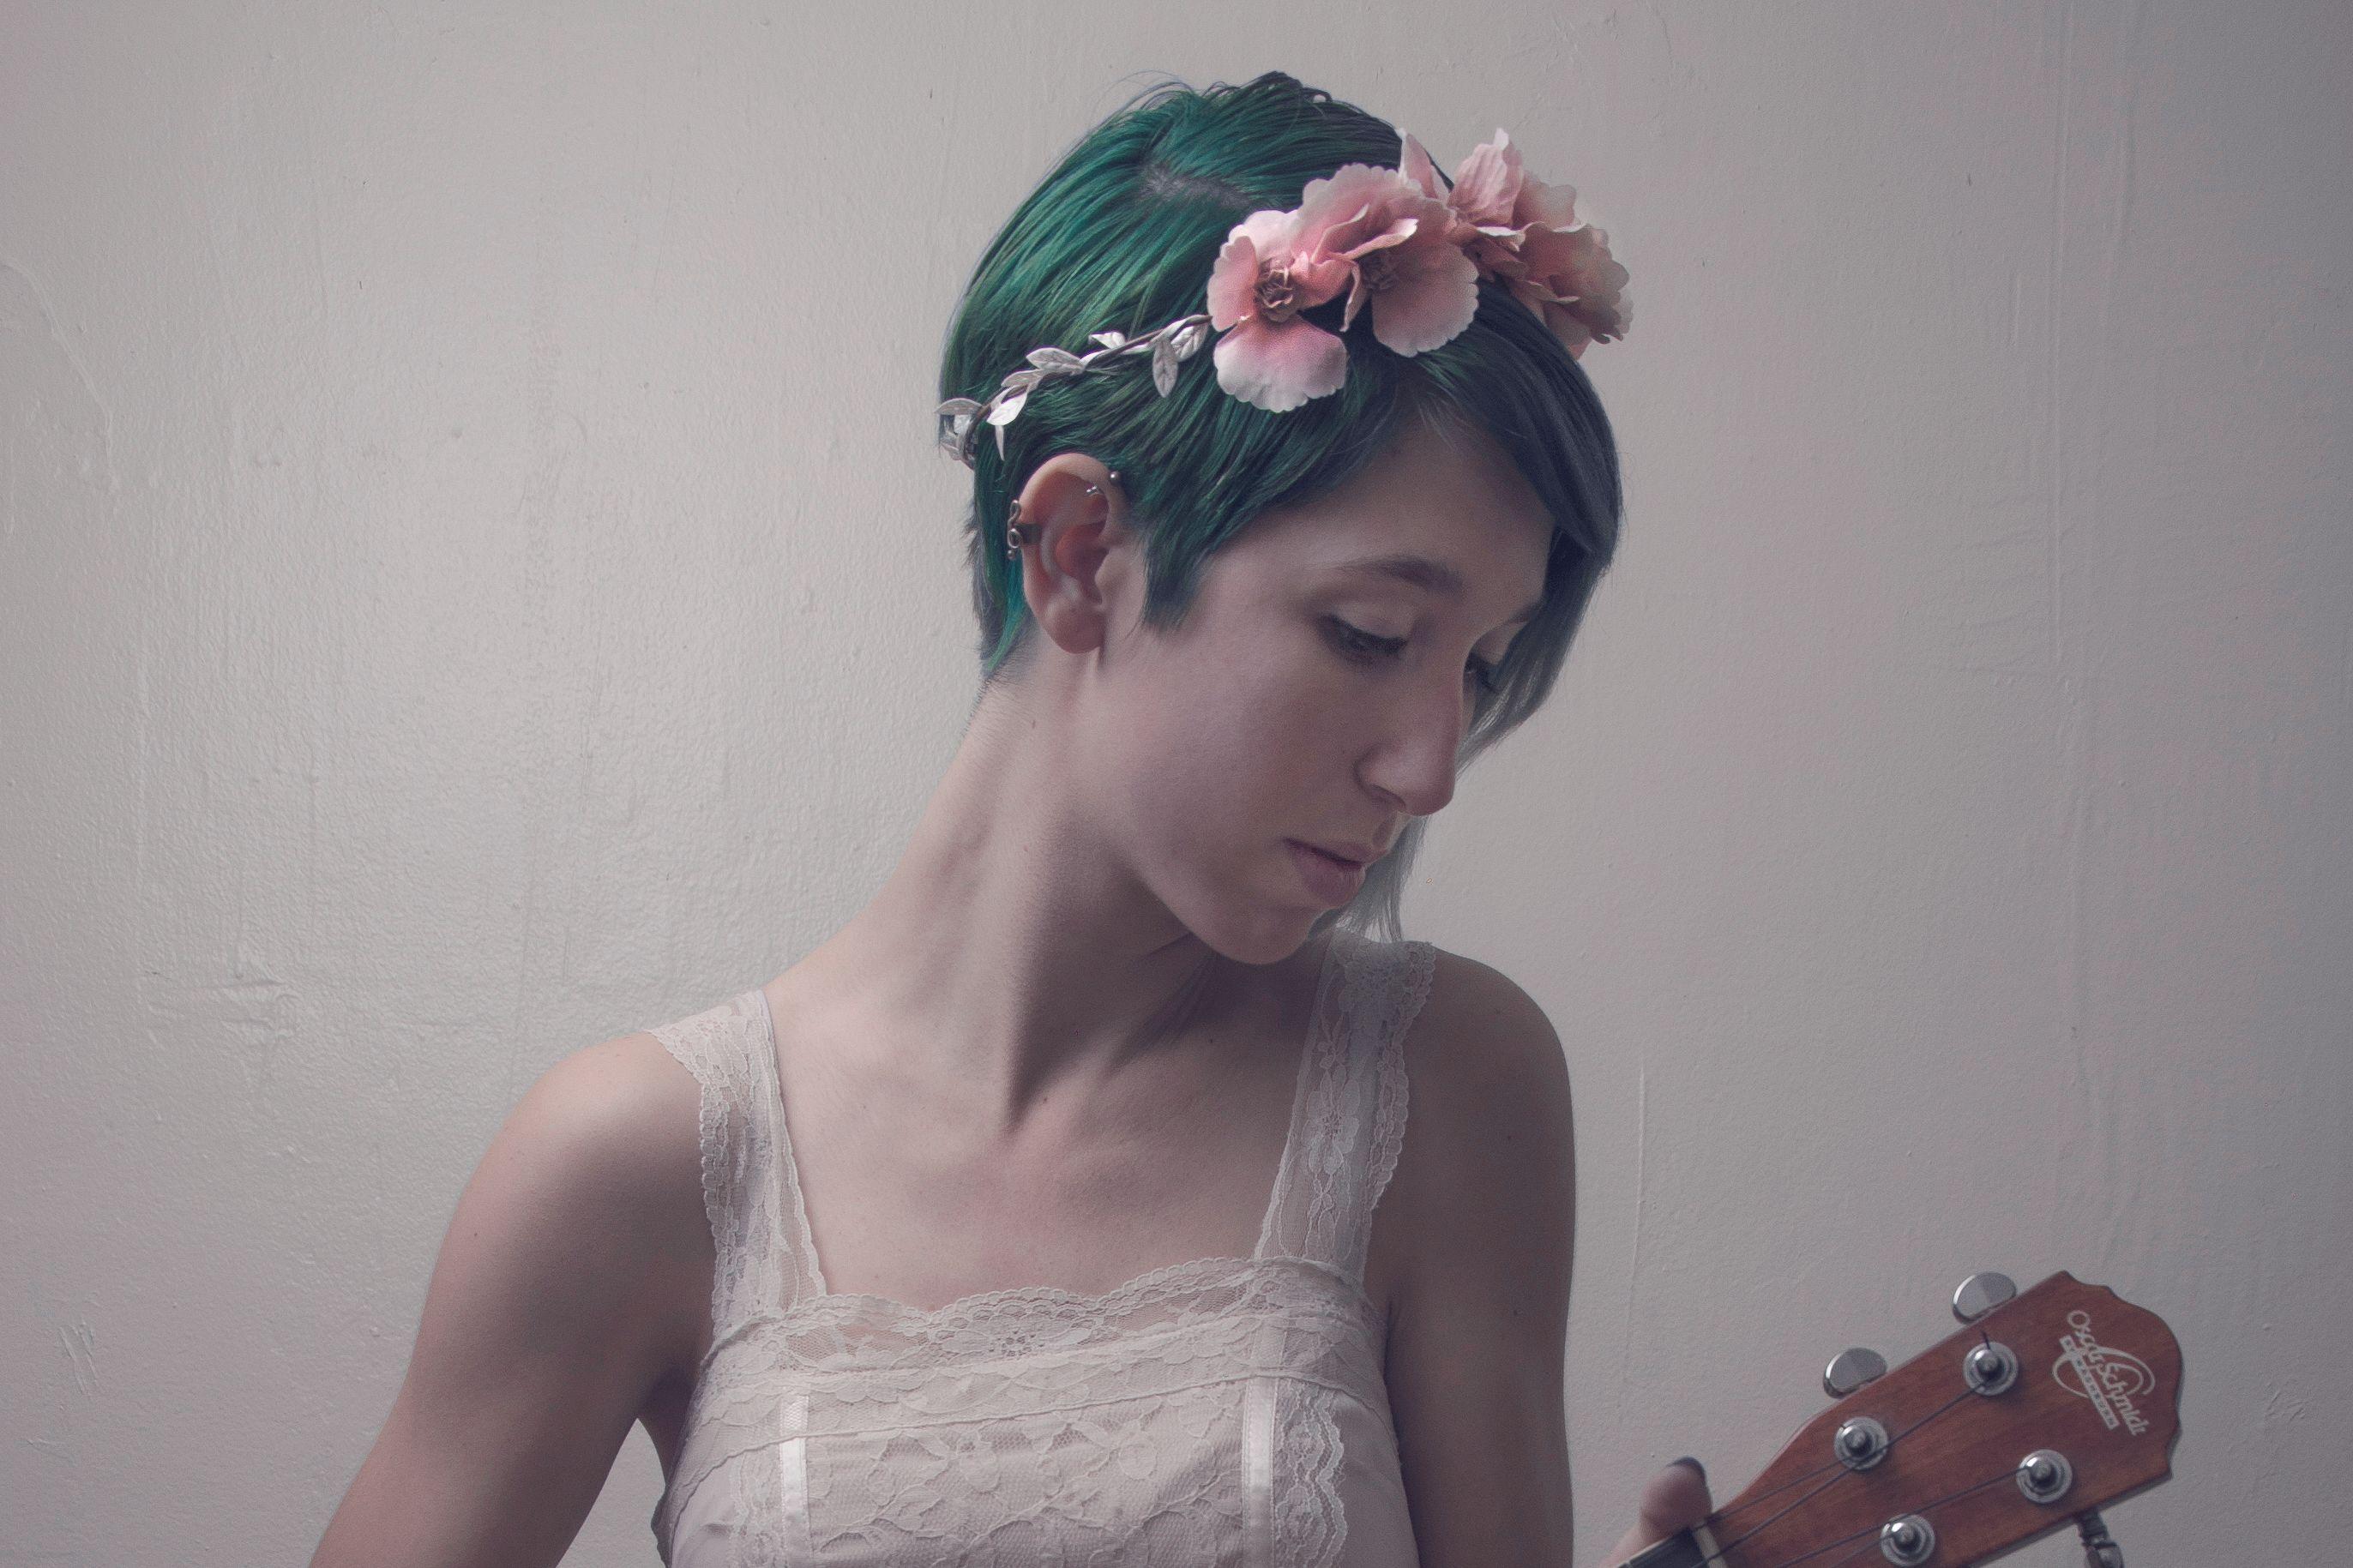 Lesa s singersongwriter xmwzmz